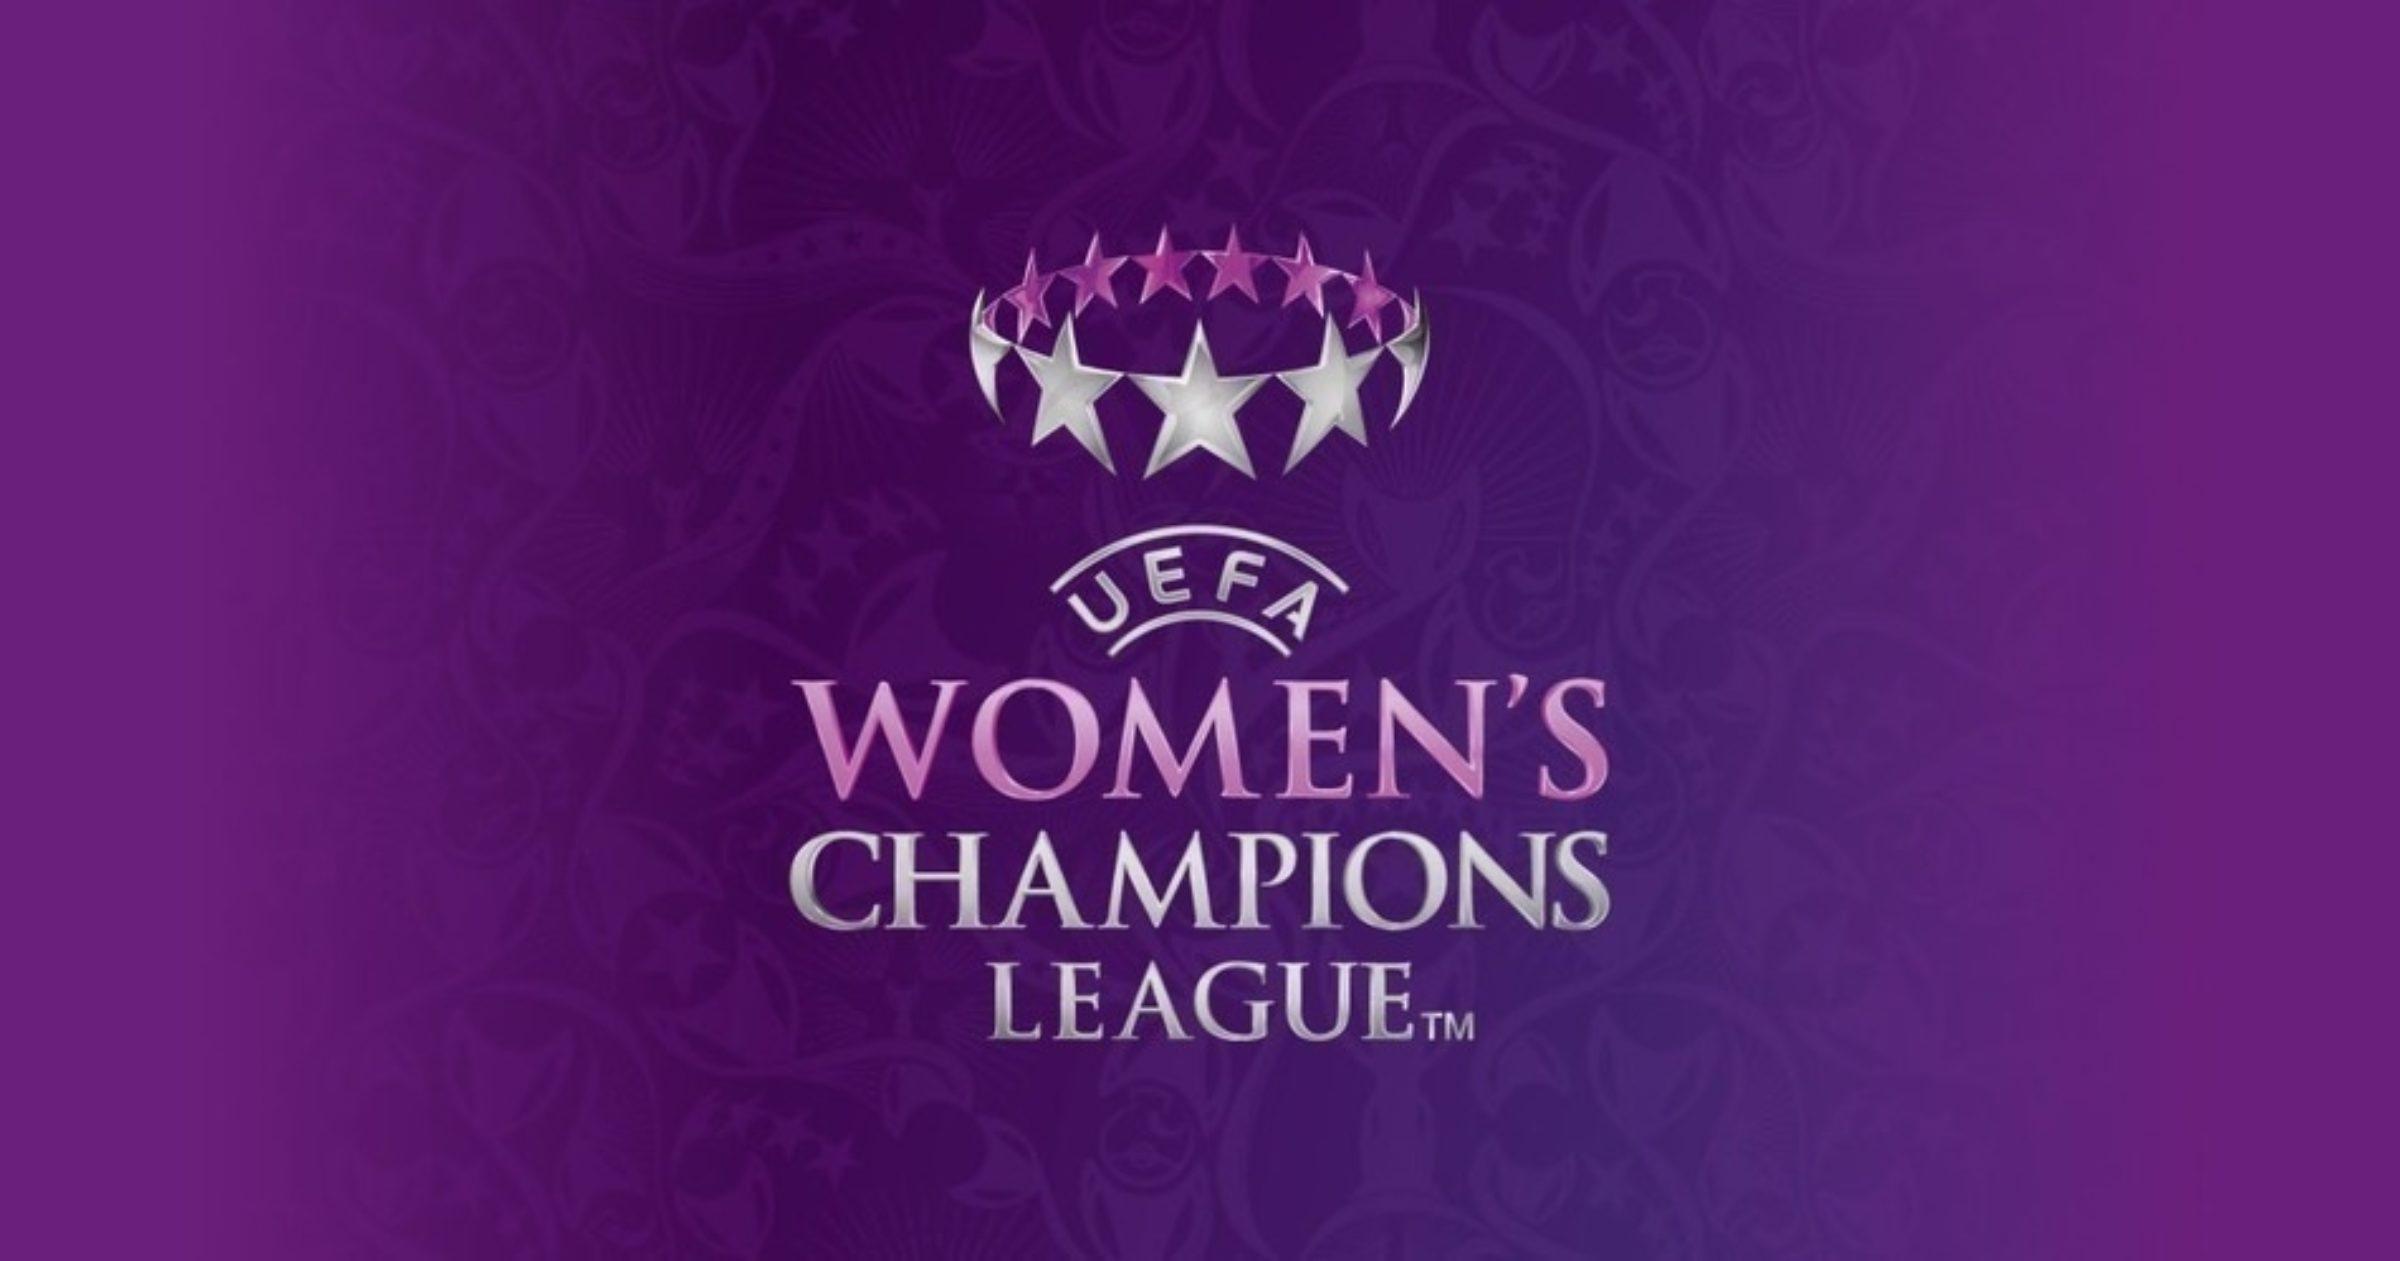 UEFA Womens Champions League 3301 1563263707 35hxl1a80l